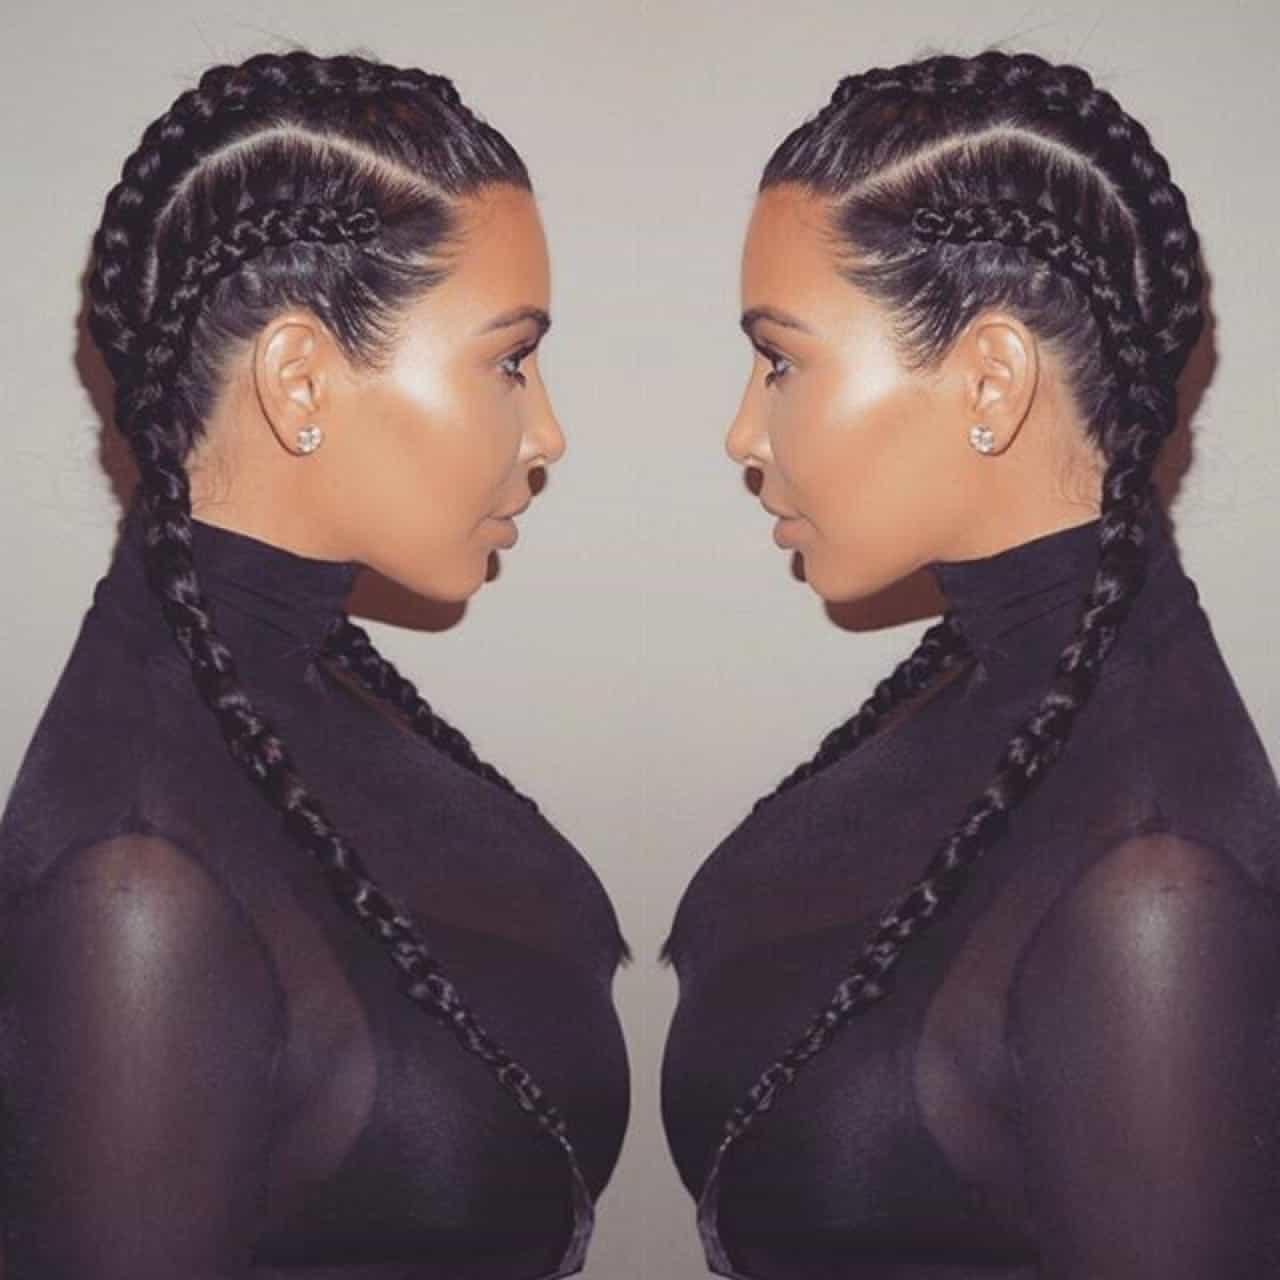 Enjoyable Kim Kardashian Braided Hairstyle With Scarf Braids Hairstyles For Women Draintrainus